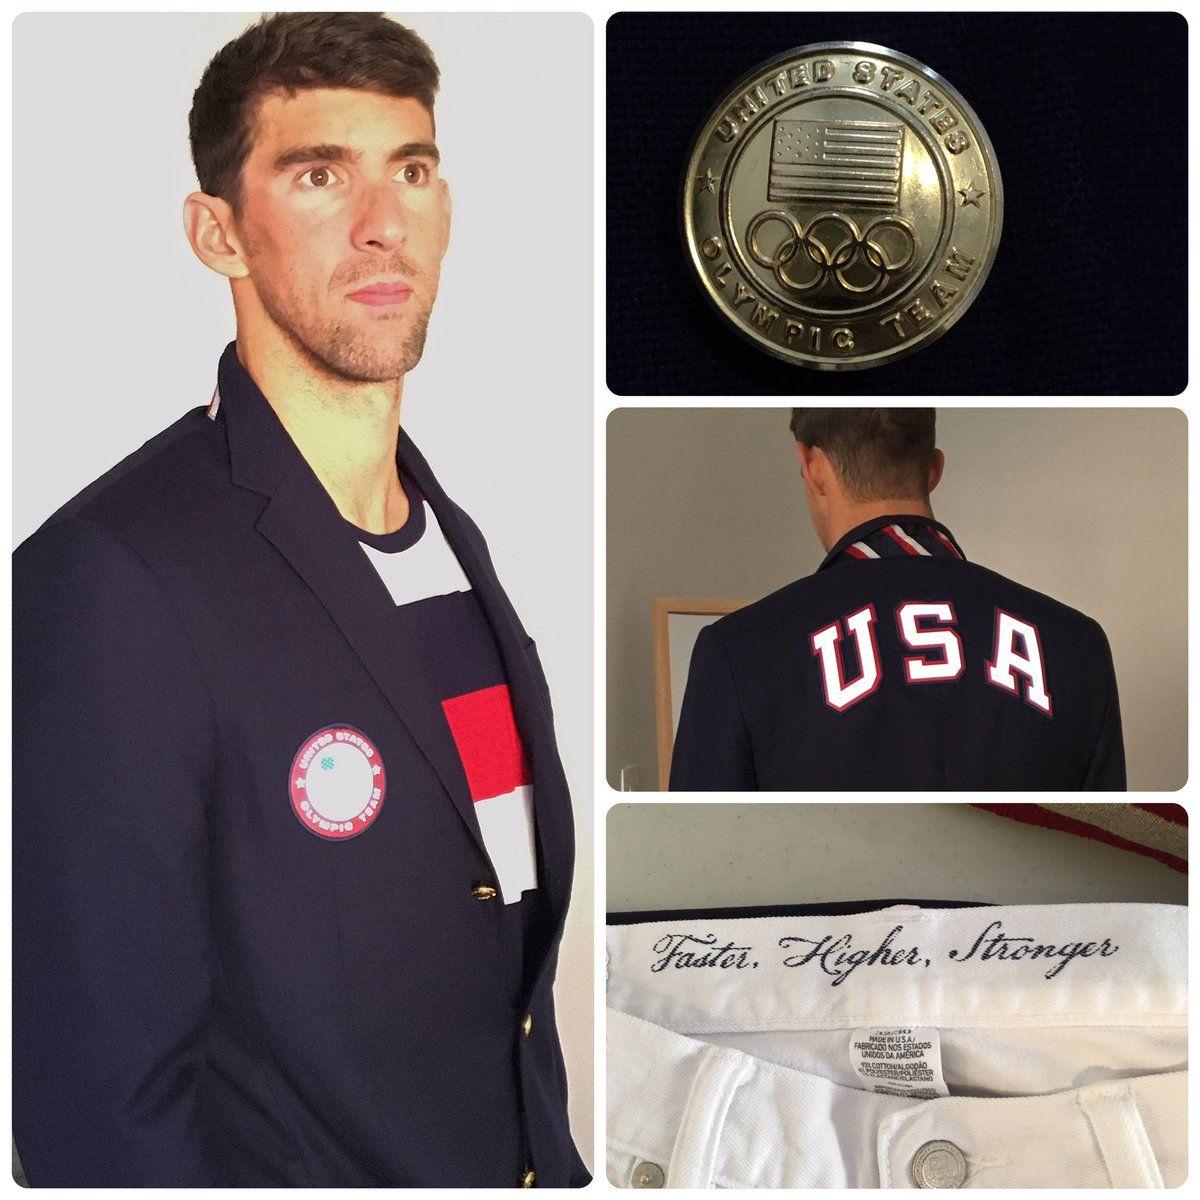 NBC Olympics Retweeted USA SwimmingVerified account